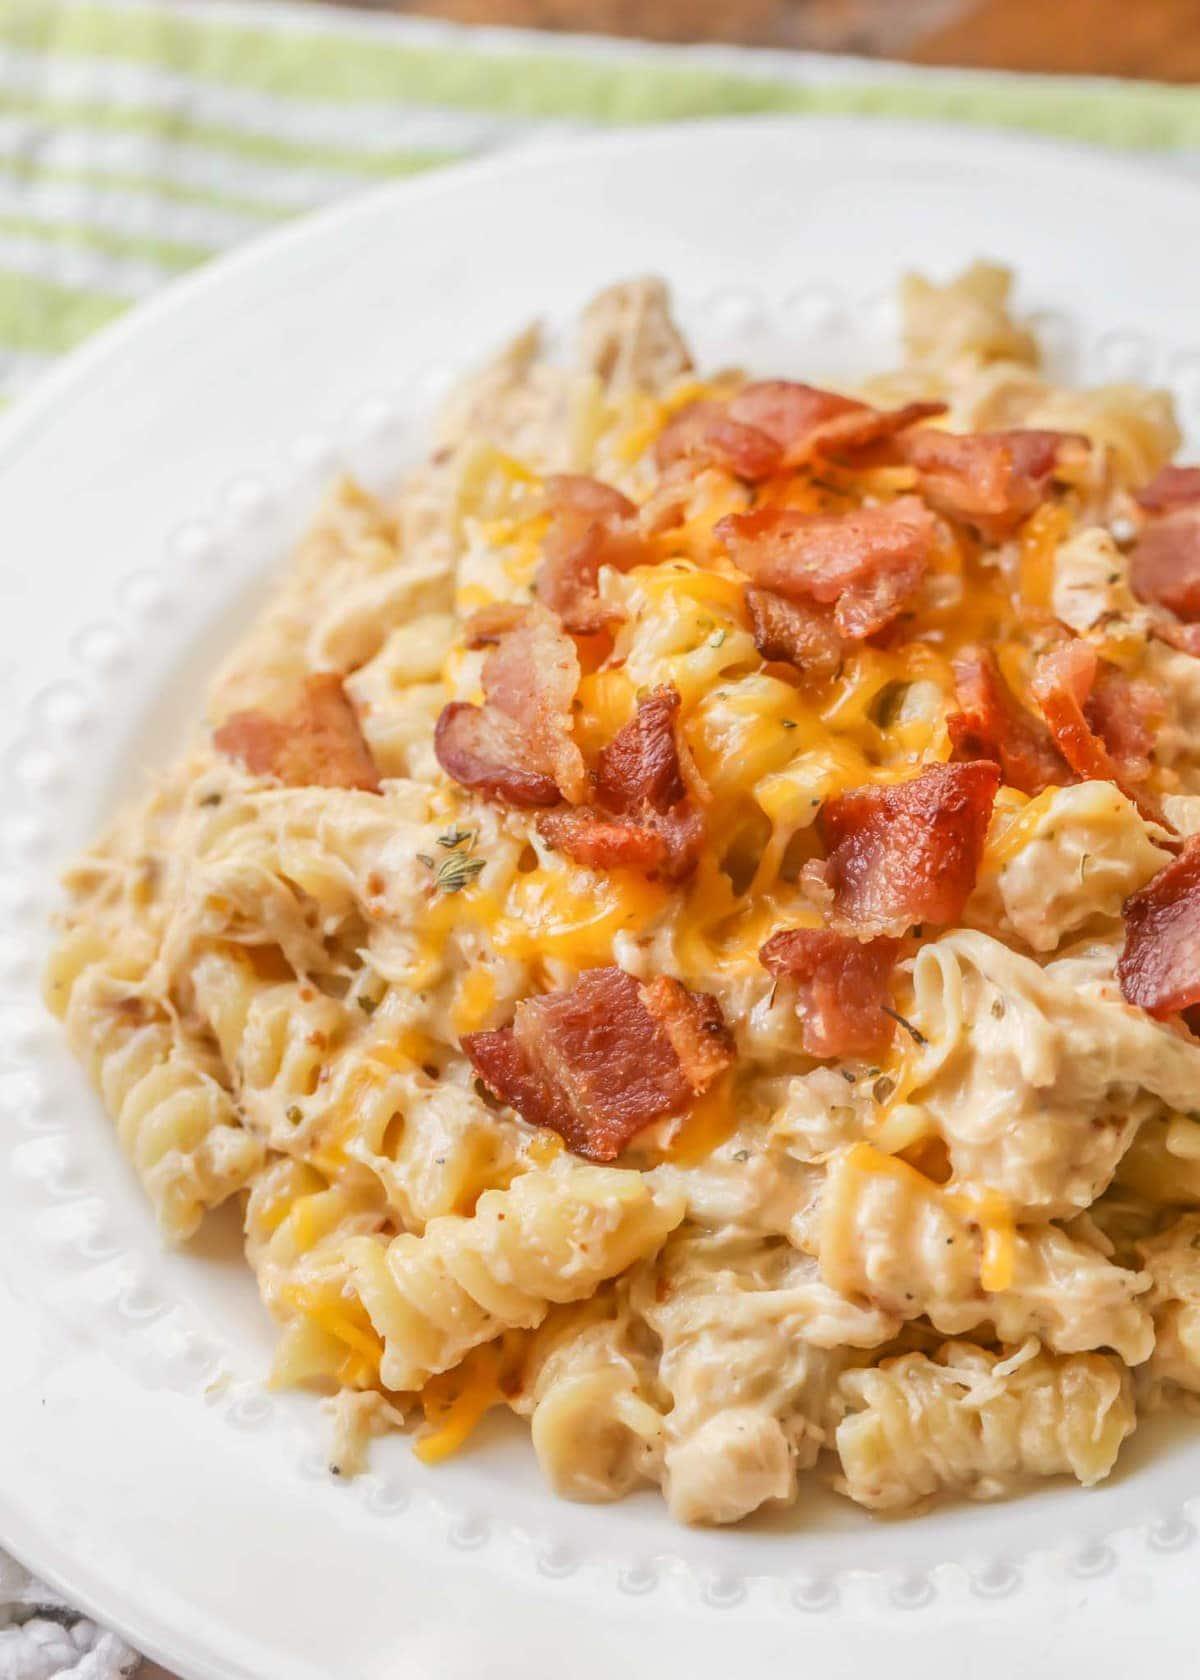 Chicken Bacon Ranch Pasta recipe on white plate